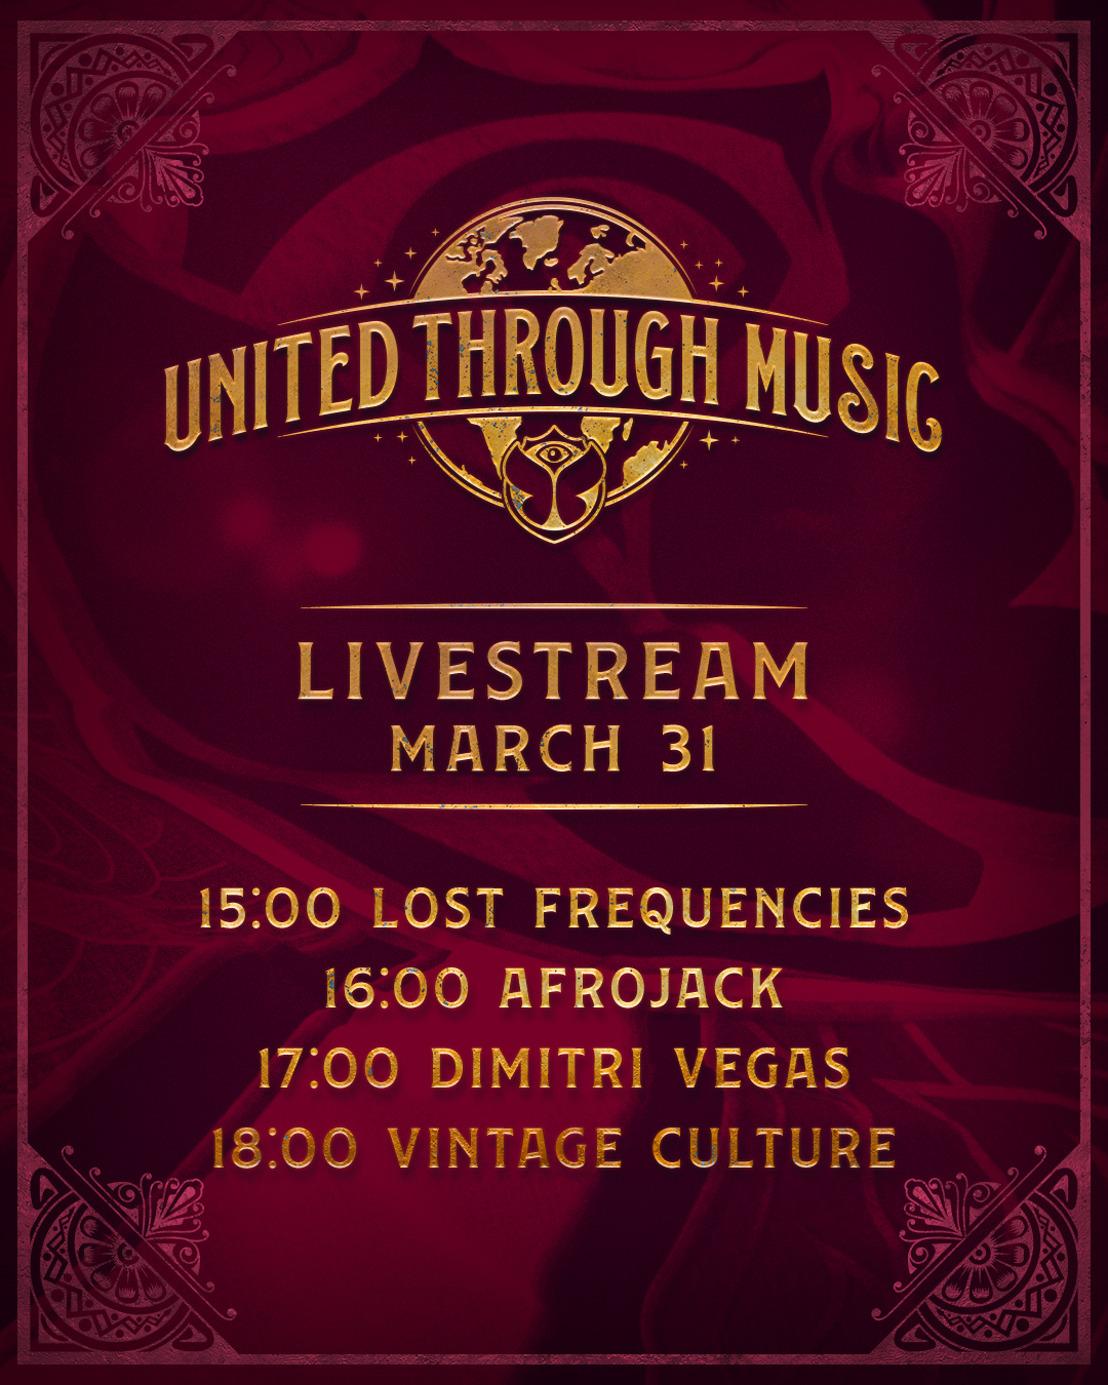 Tomorrowland Presents: United Through Music